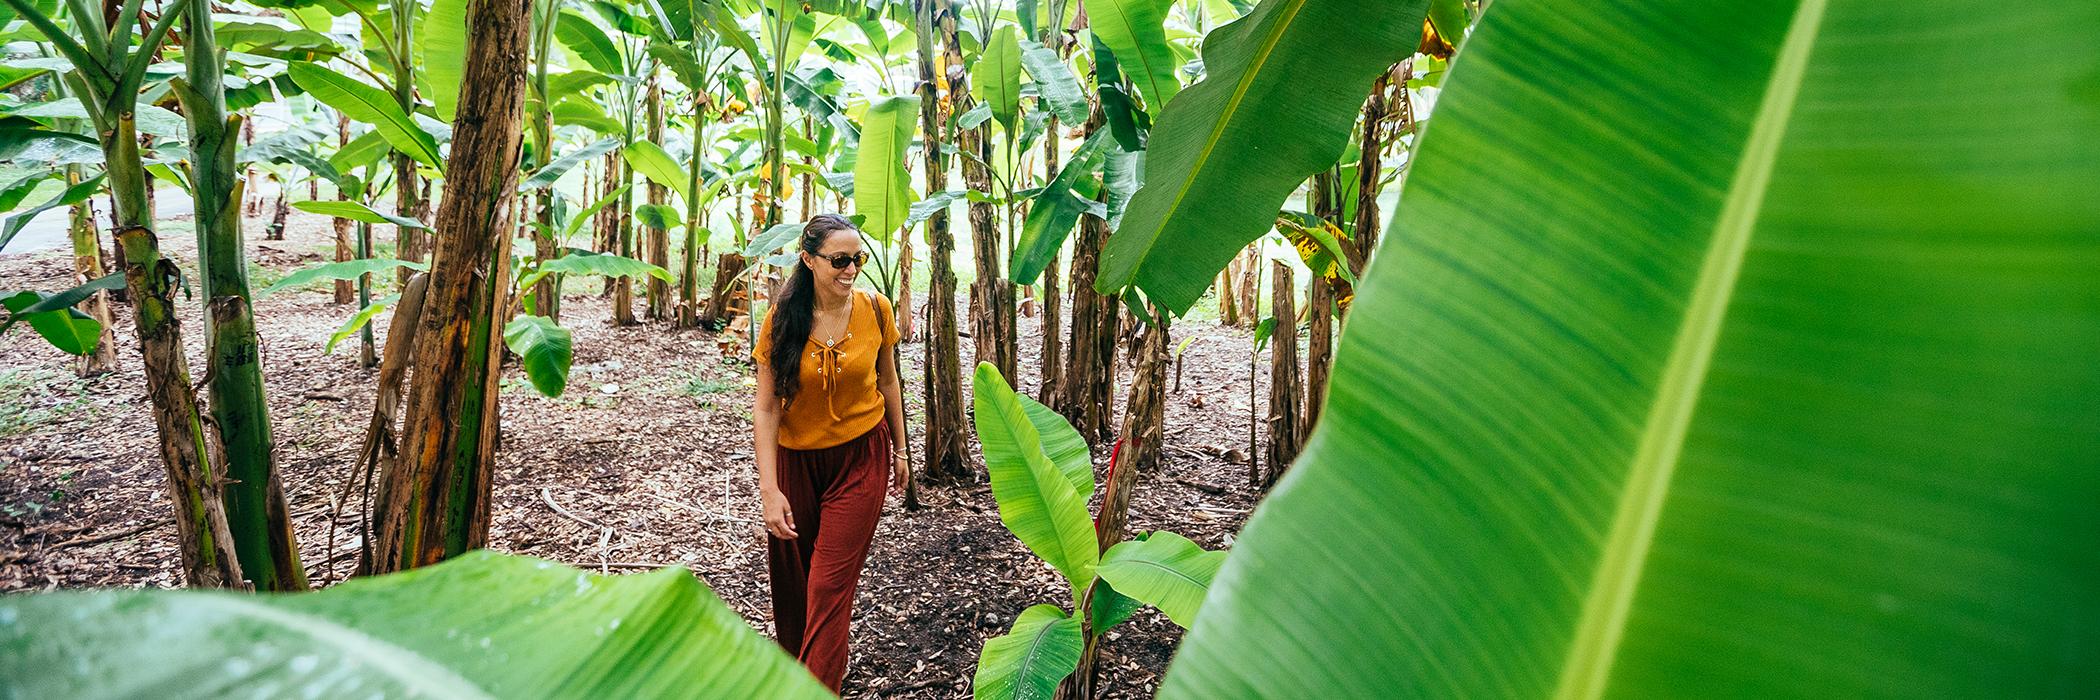 A woman explores the botanical garden & wildlife sanctuary at Flamingo Gardens